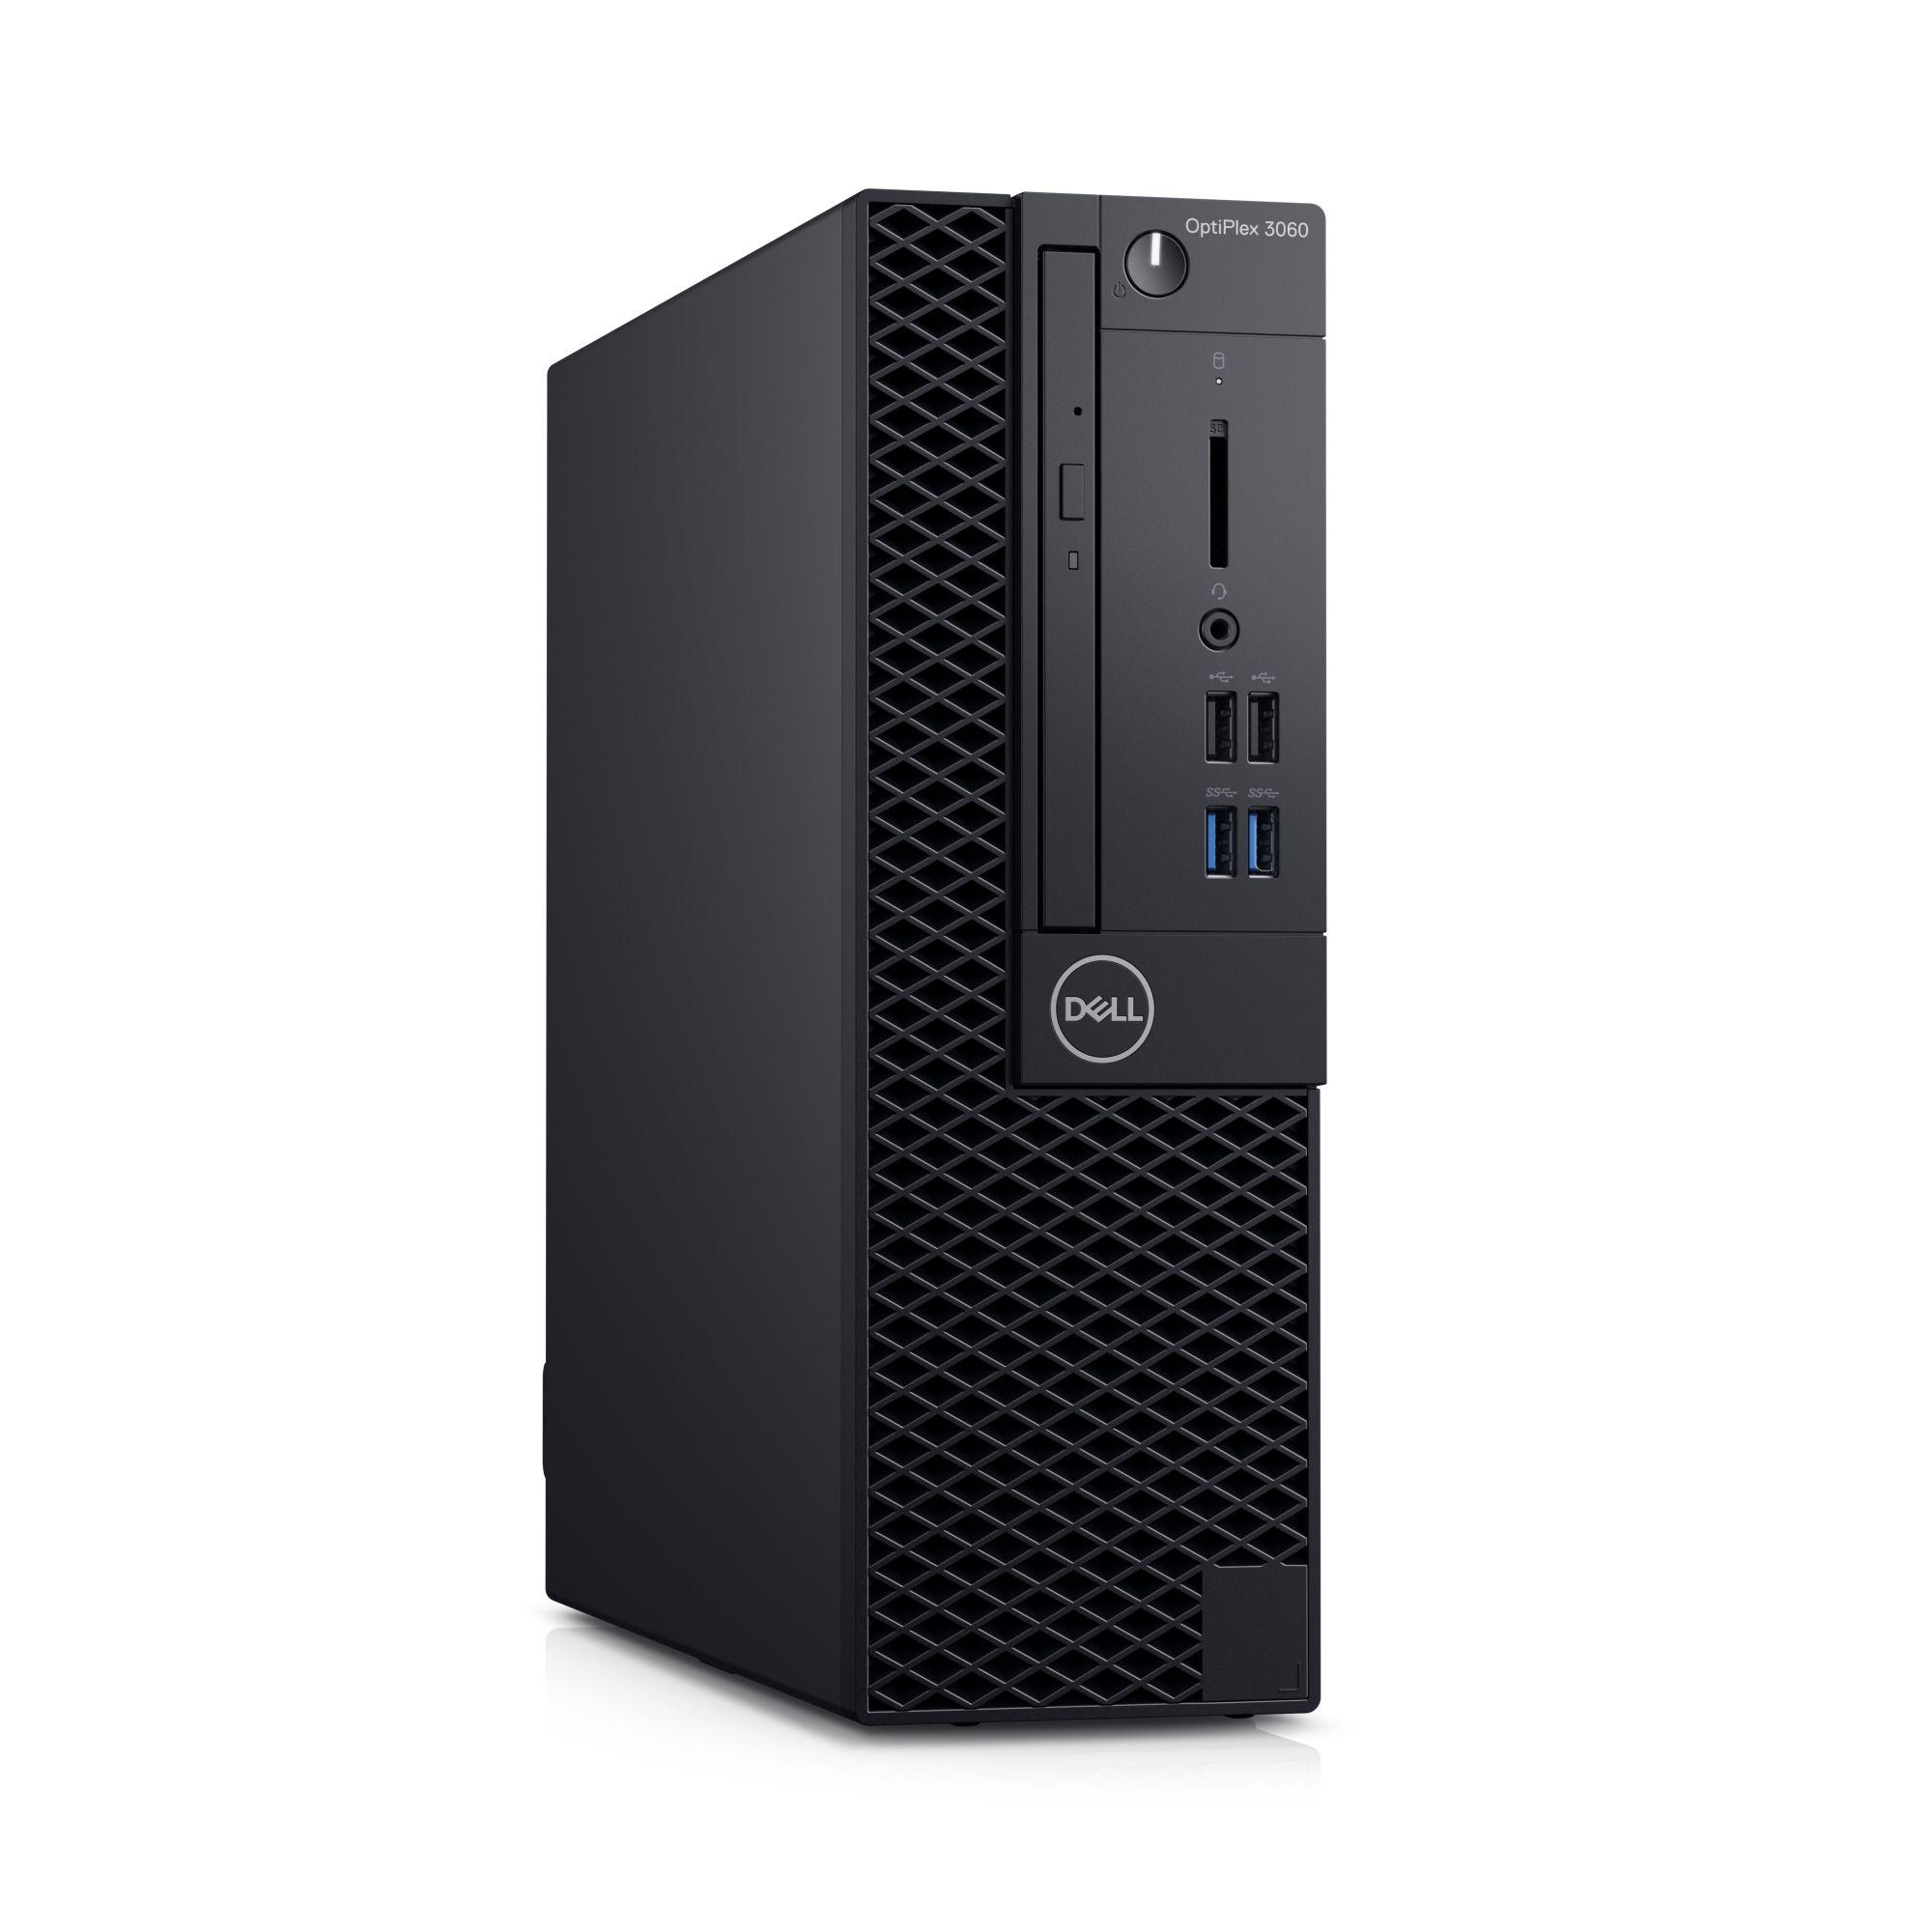 Dell PC Optiplex 3060 SF i3-8100/8GB/256GB SSD/HDMI/DP/DVD/W10P/3RNBD